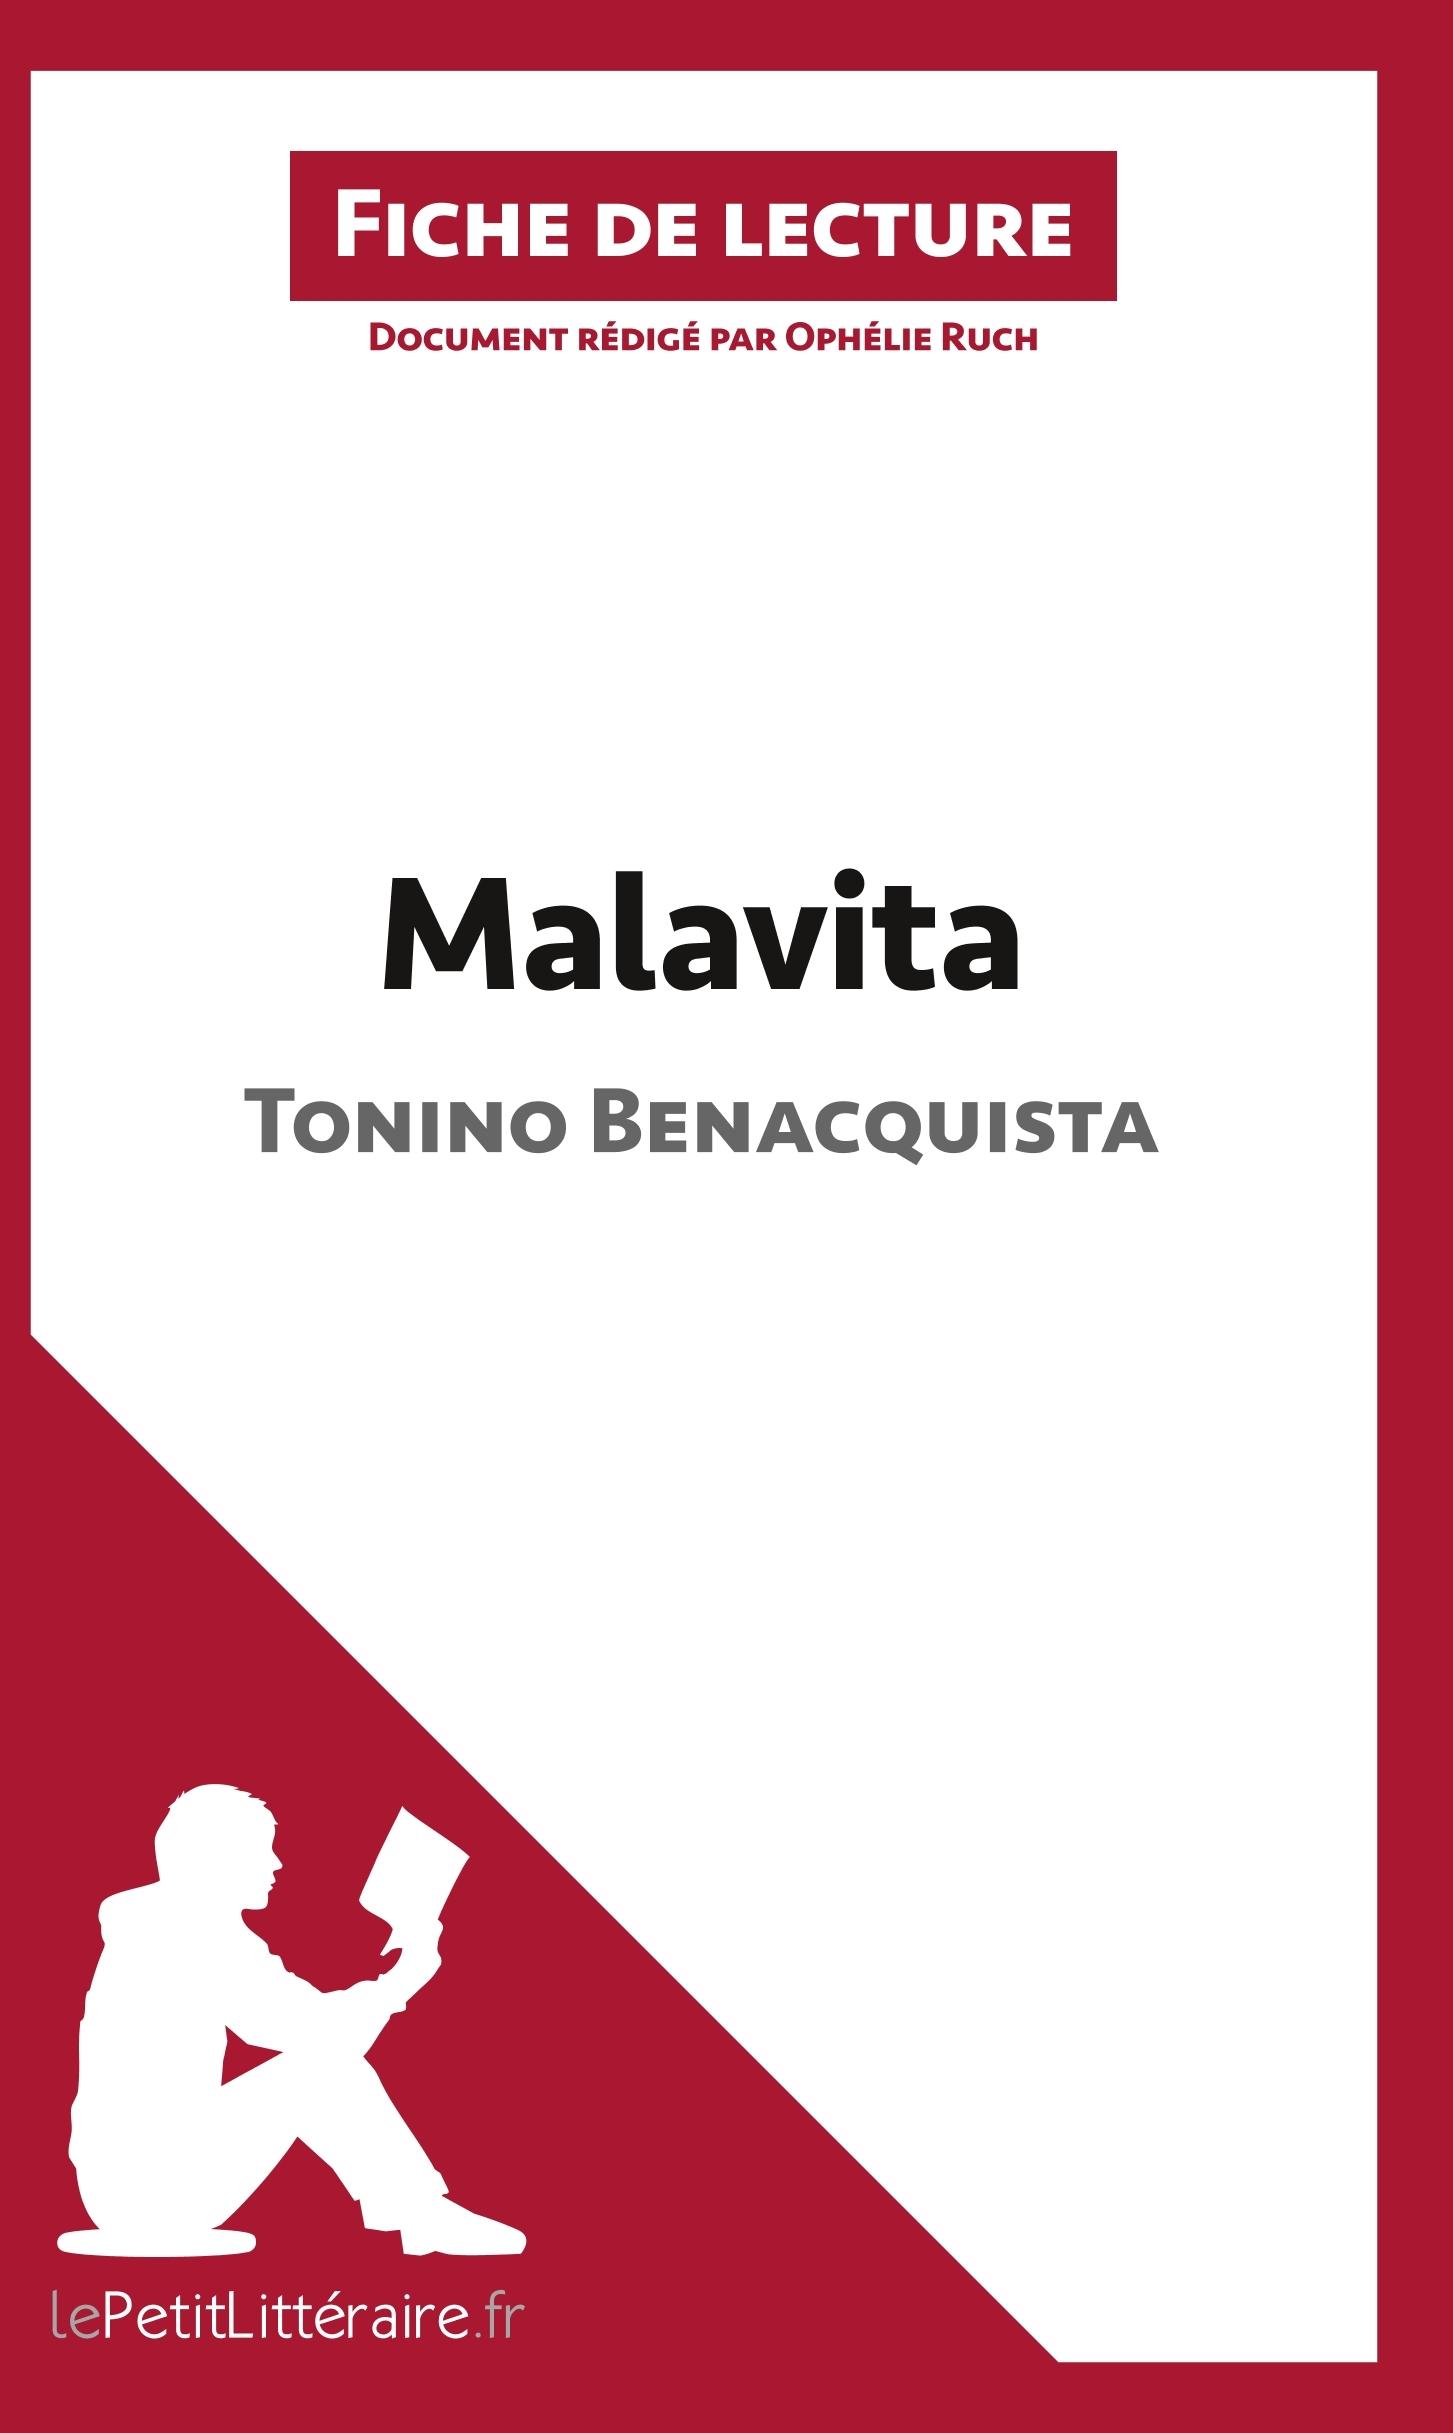 ANALYSE MALAVITA DE TONINO BENACQUISTA ANALYSE COMPLETE DE L UVRE ET RESUME